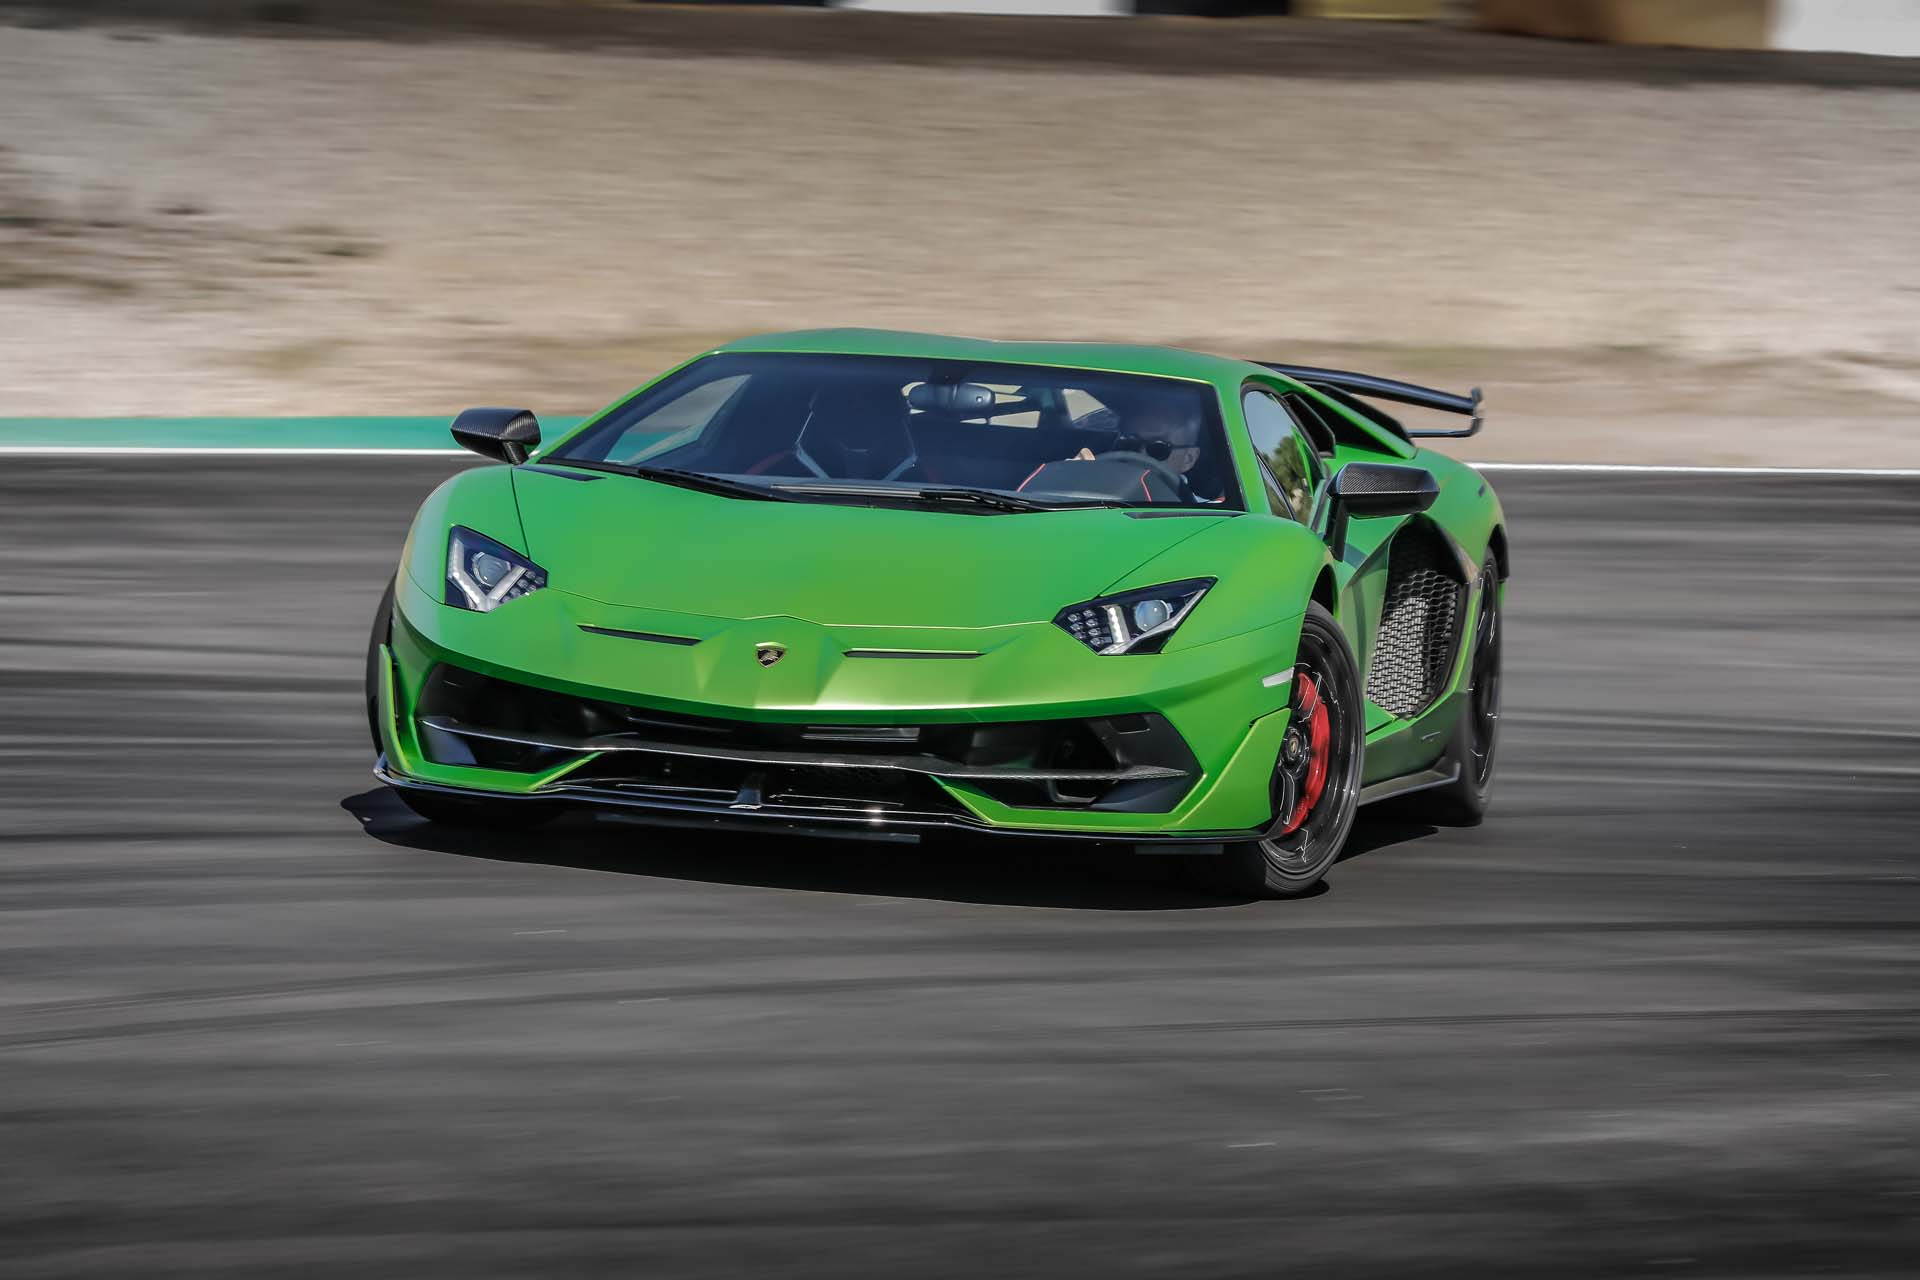 2019 Lamborghini Aventador SVJ Front Wallpapers (14)